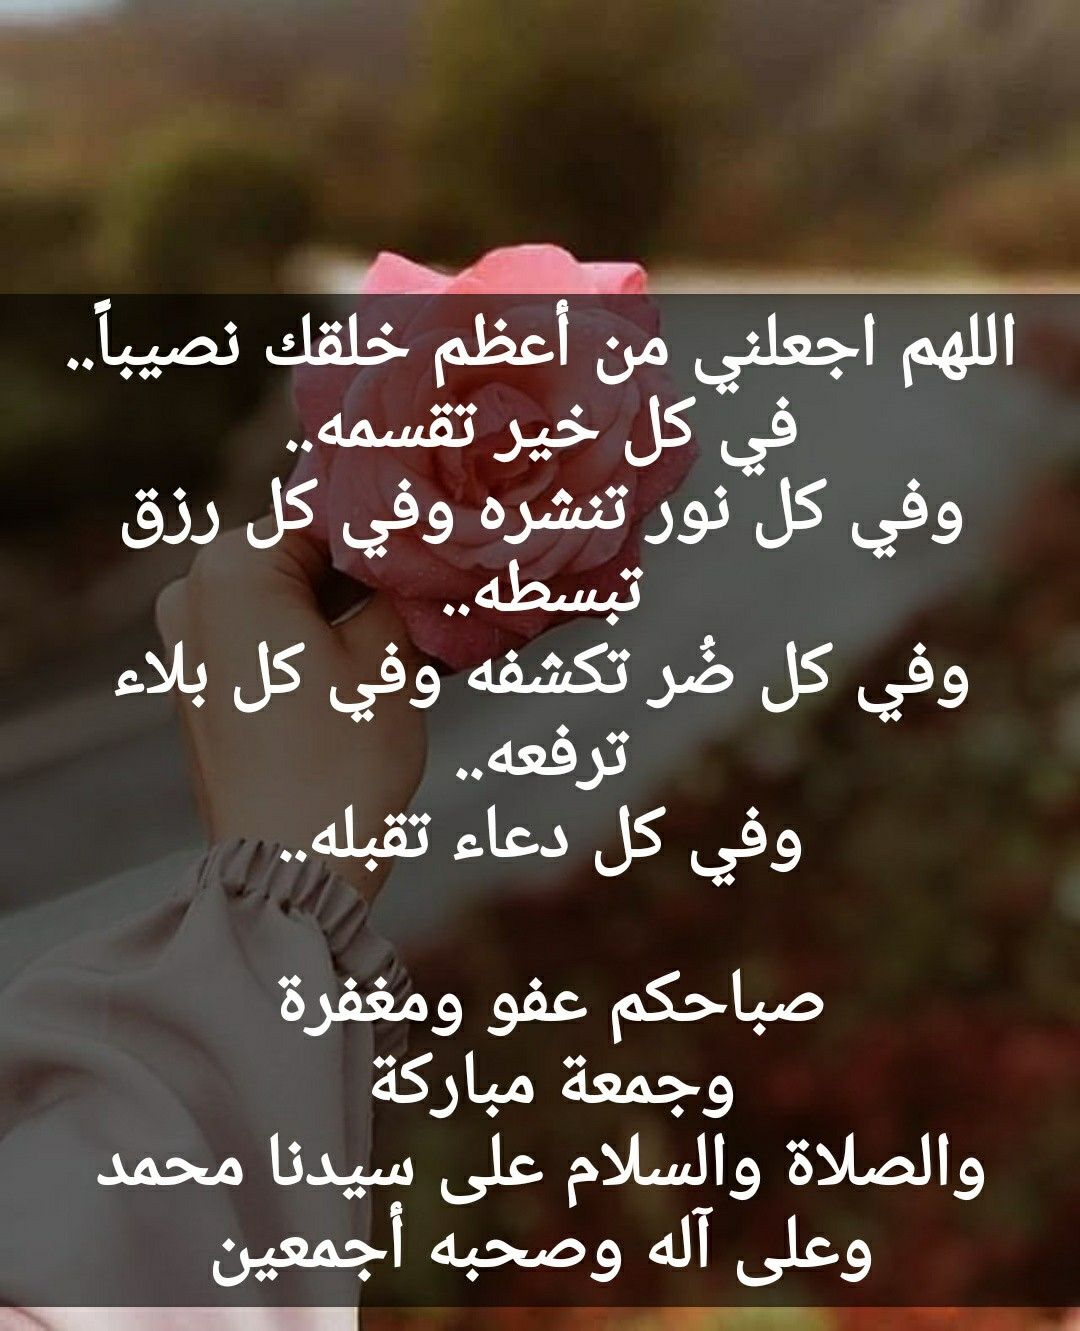 Pin By Abir Reine On احلى المشاعر في ارواحنا سبحان الله Good Morning Gif Morning Gif Calm Artwork